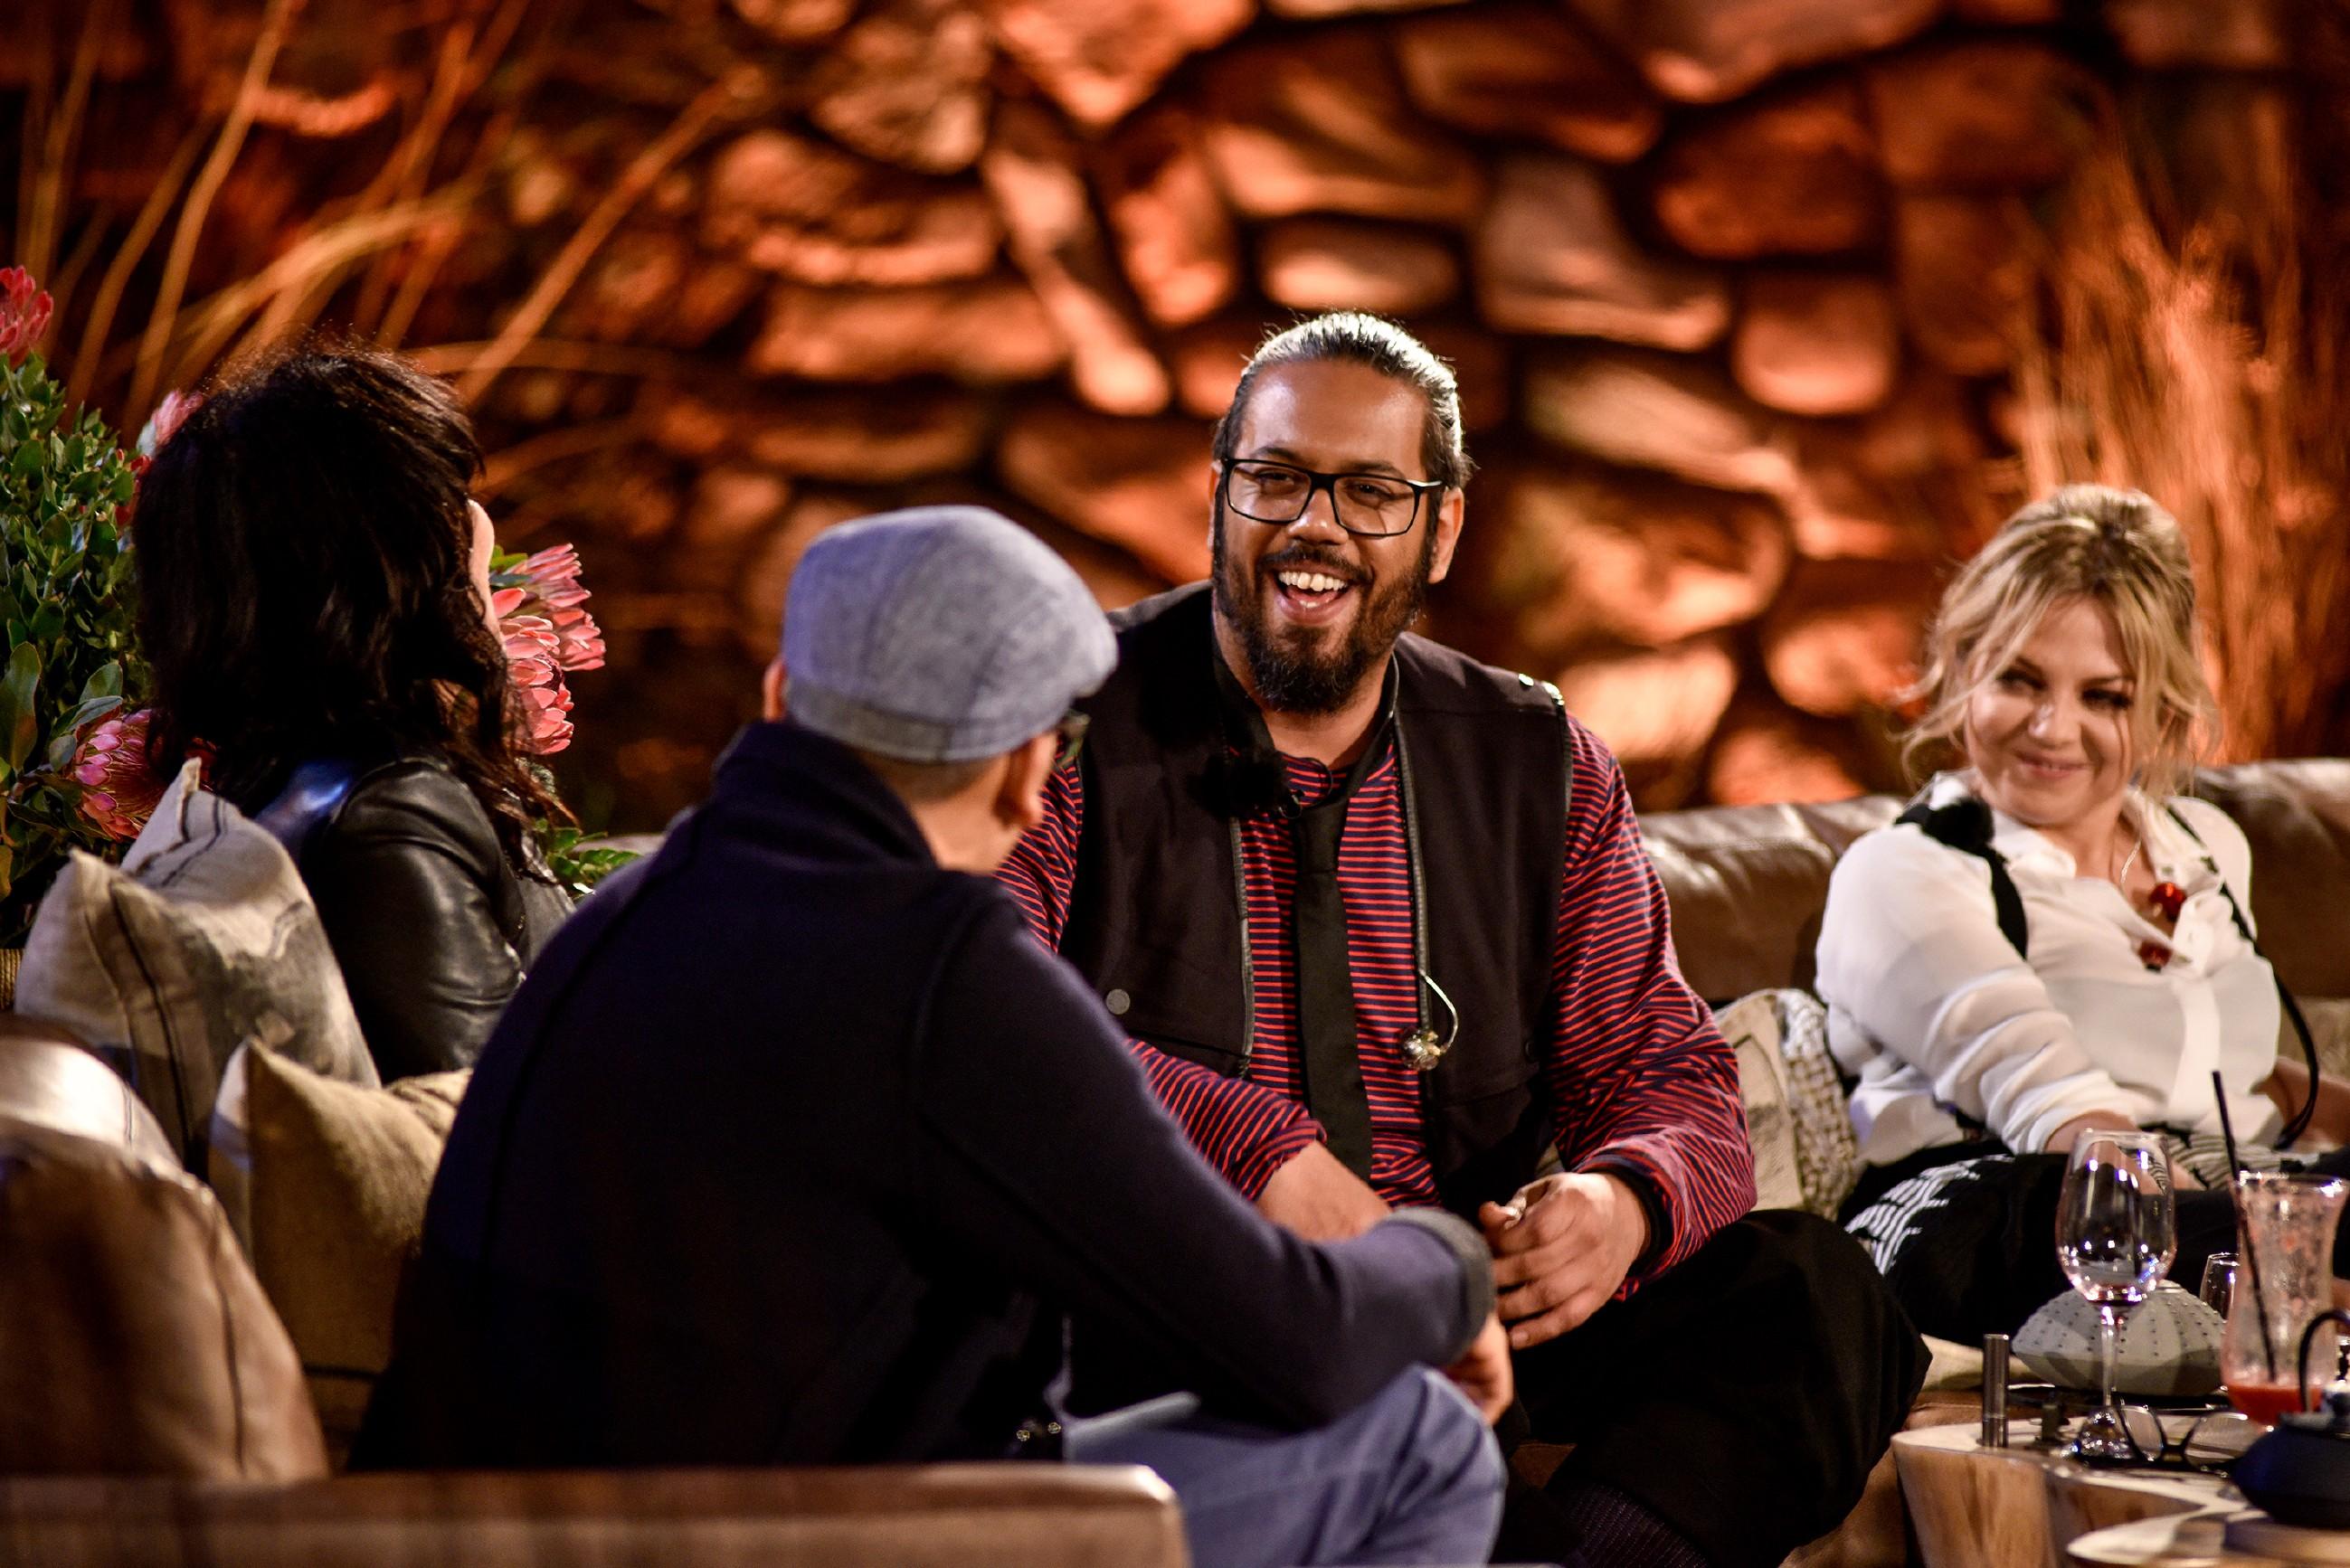 V.l.: Xavier Naidoo, NENA, Samy Deluxe, Annett Louisan - Foto: VOX / Markus Hertrich